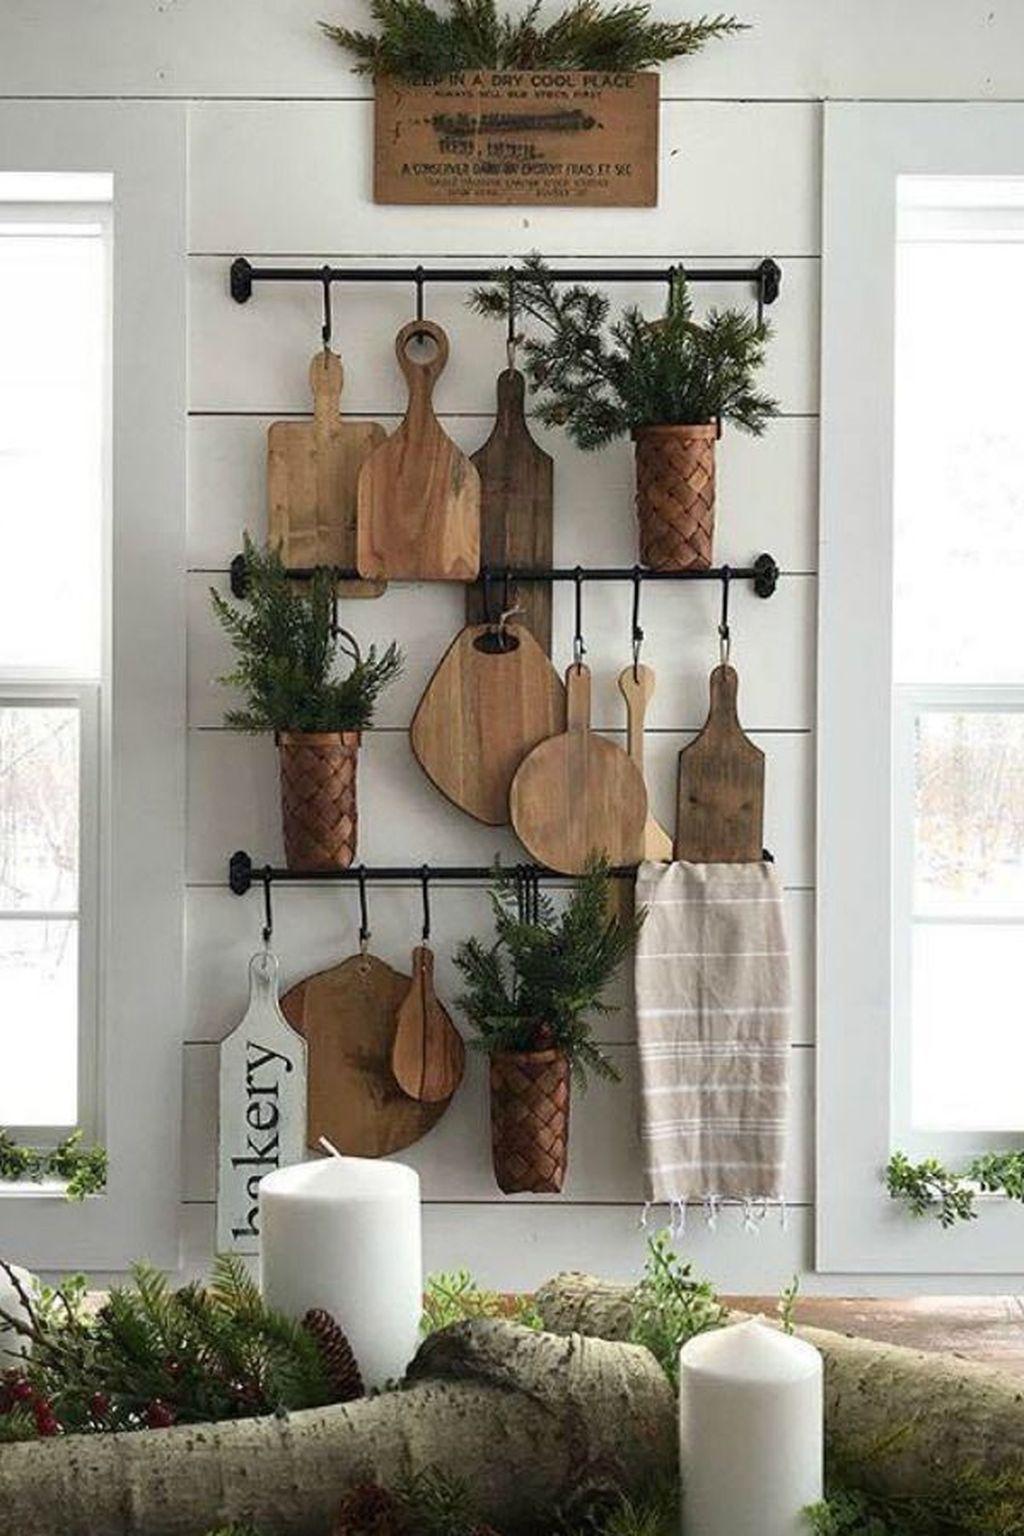 32 The Best Farmhouse Kitchen Decor Ideas | Herramientas y Cocinas